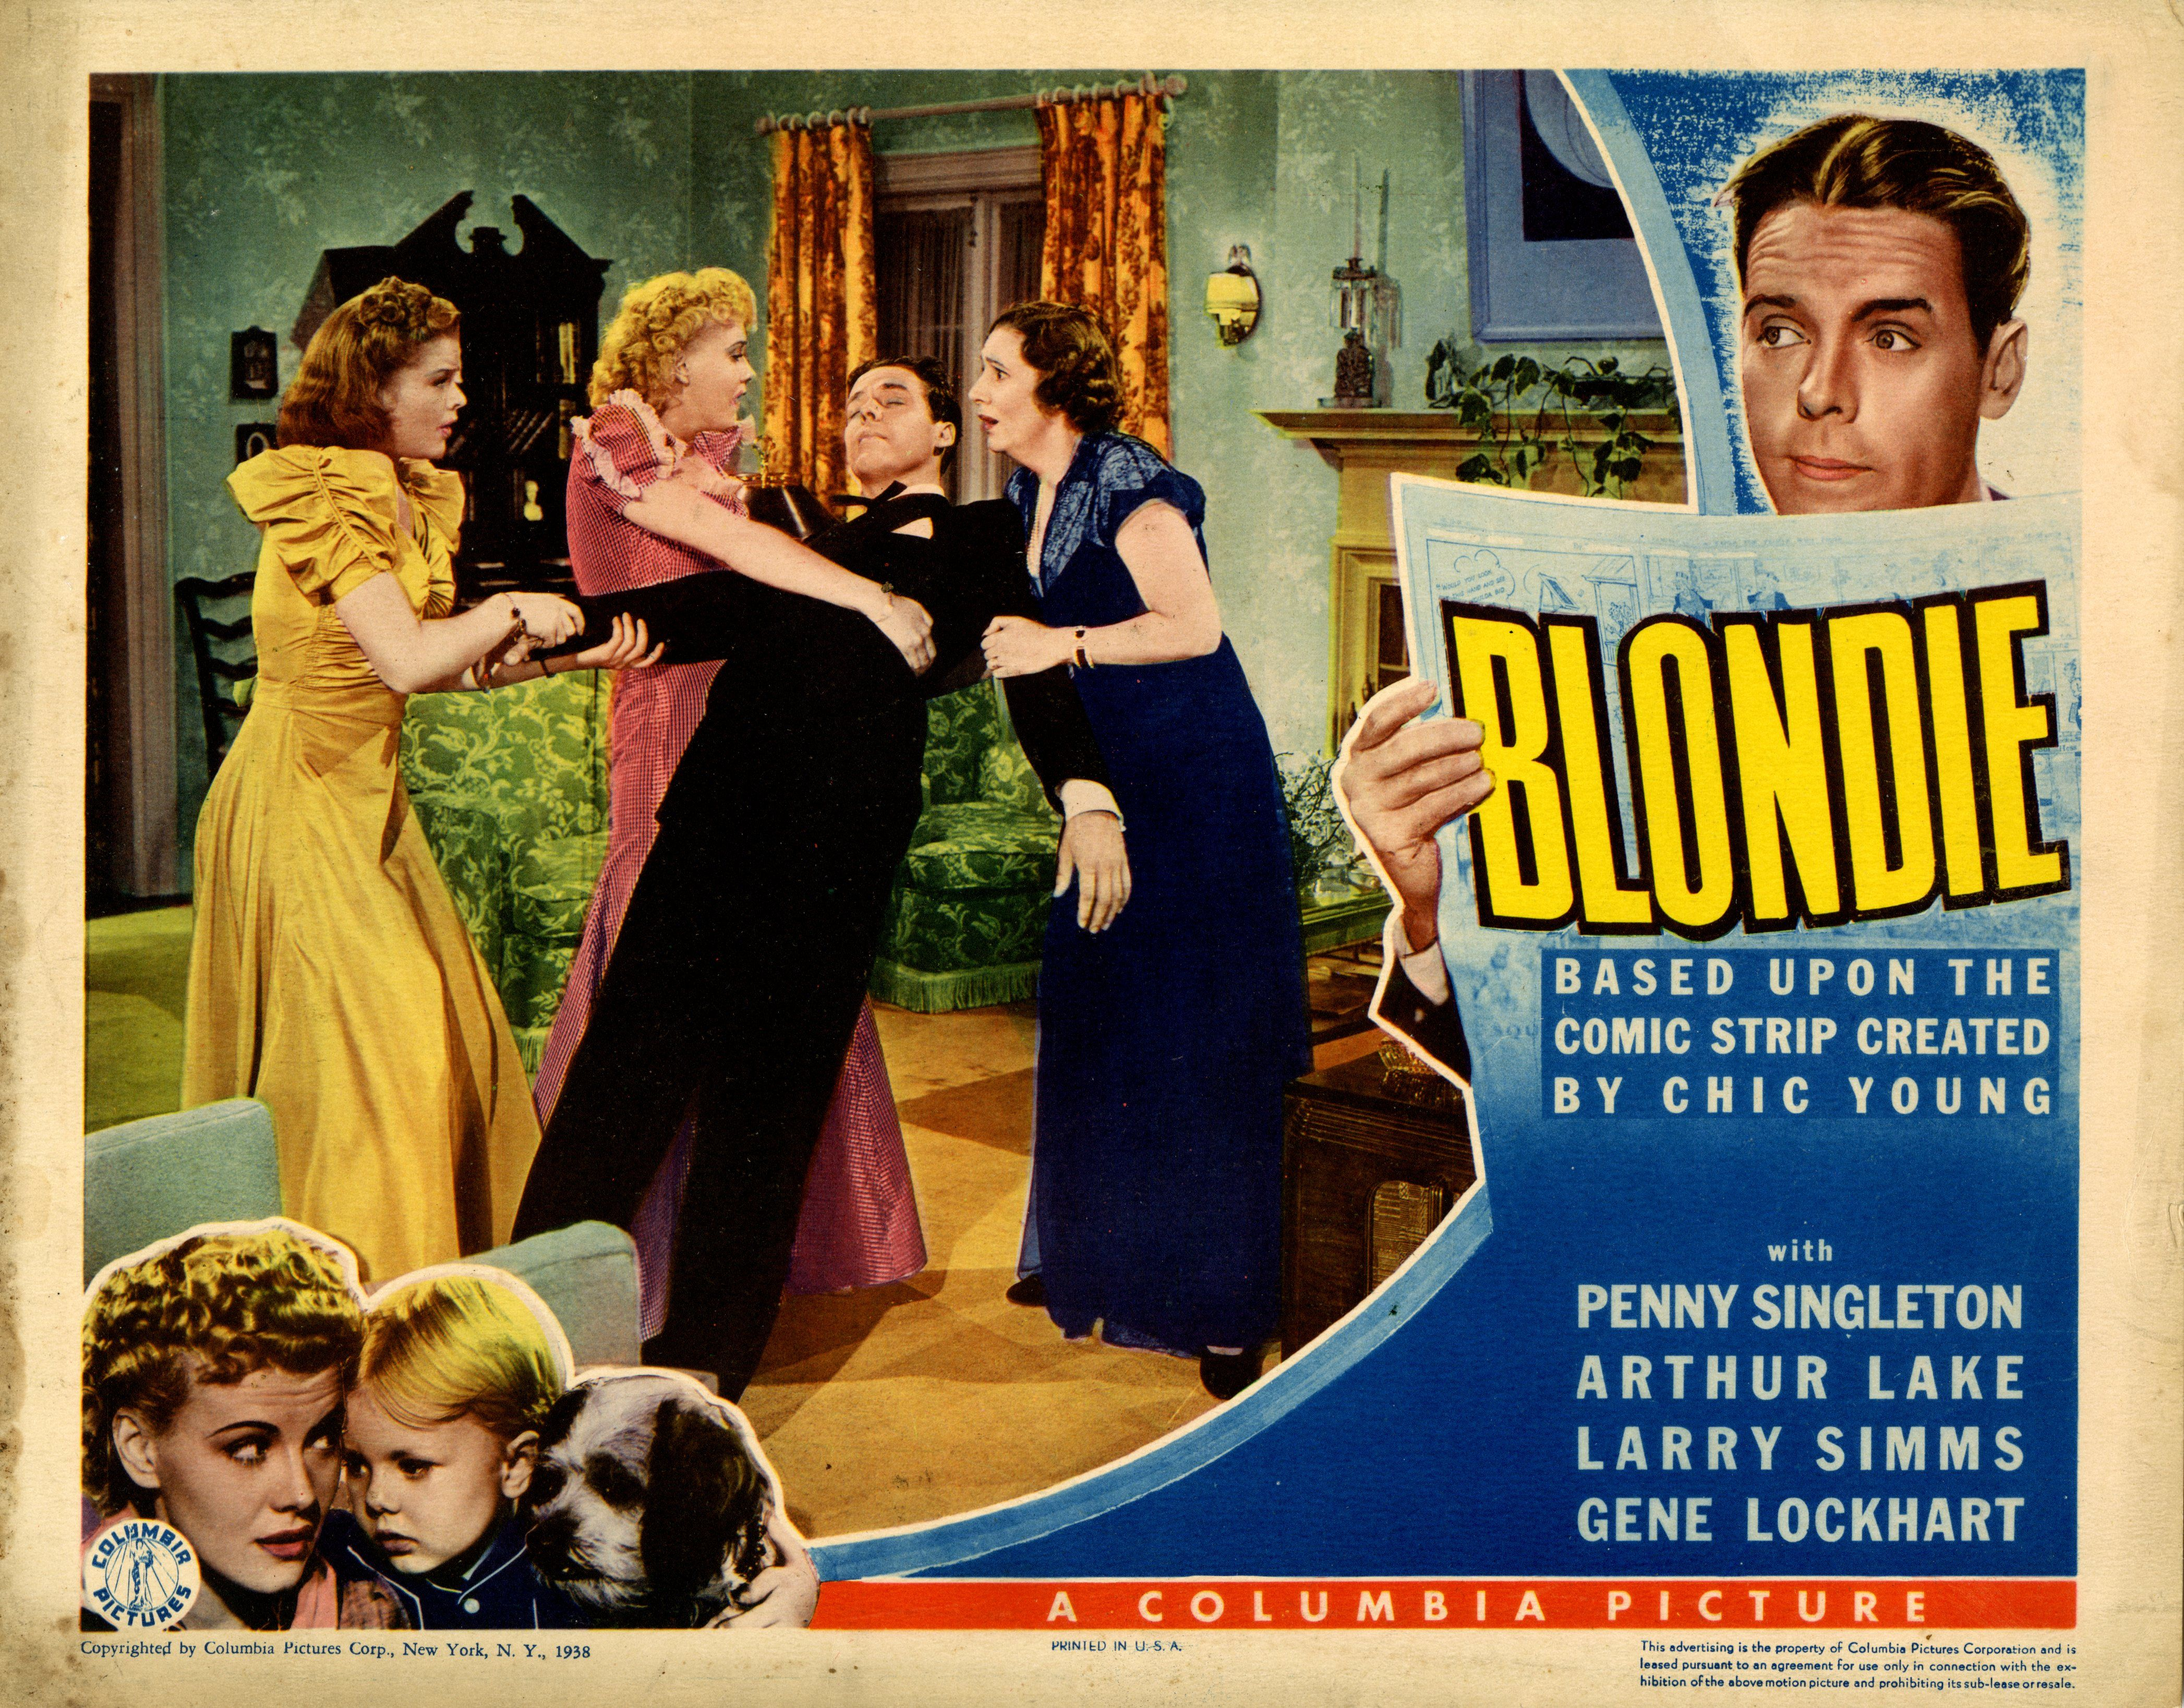 Arthur Lake, Kathleen Lockhart, Dorothy Moore, Larry Simms, and Penny Singleton in Blondie (1938)